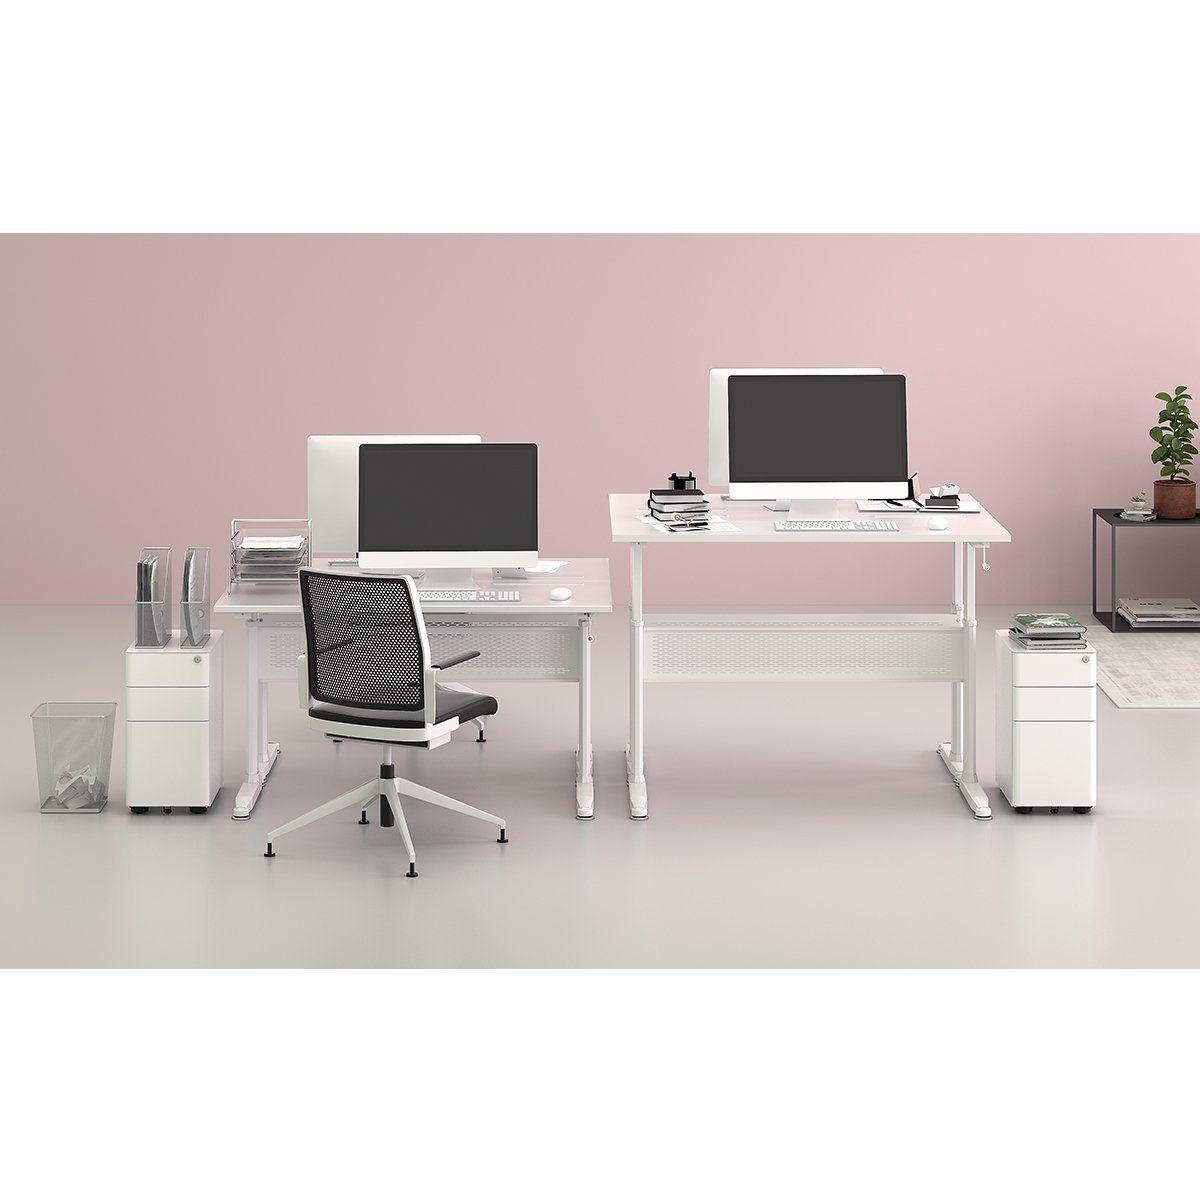 Incredible Amazon Com Devaise Adjustable Height Standing Desk 55 Home Interior And Landscaping Ponolsignezvosmurscom